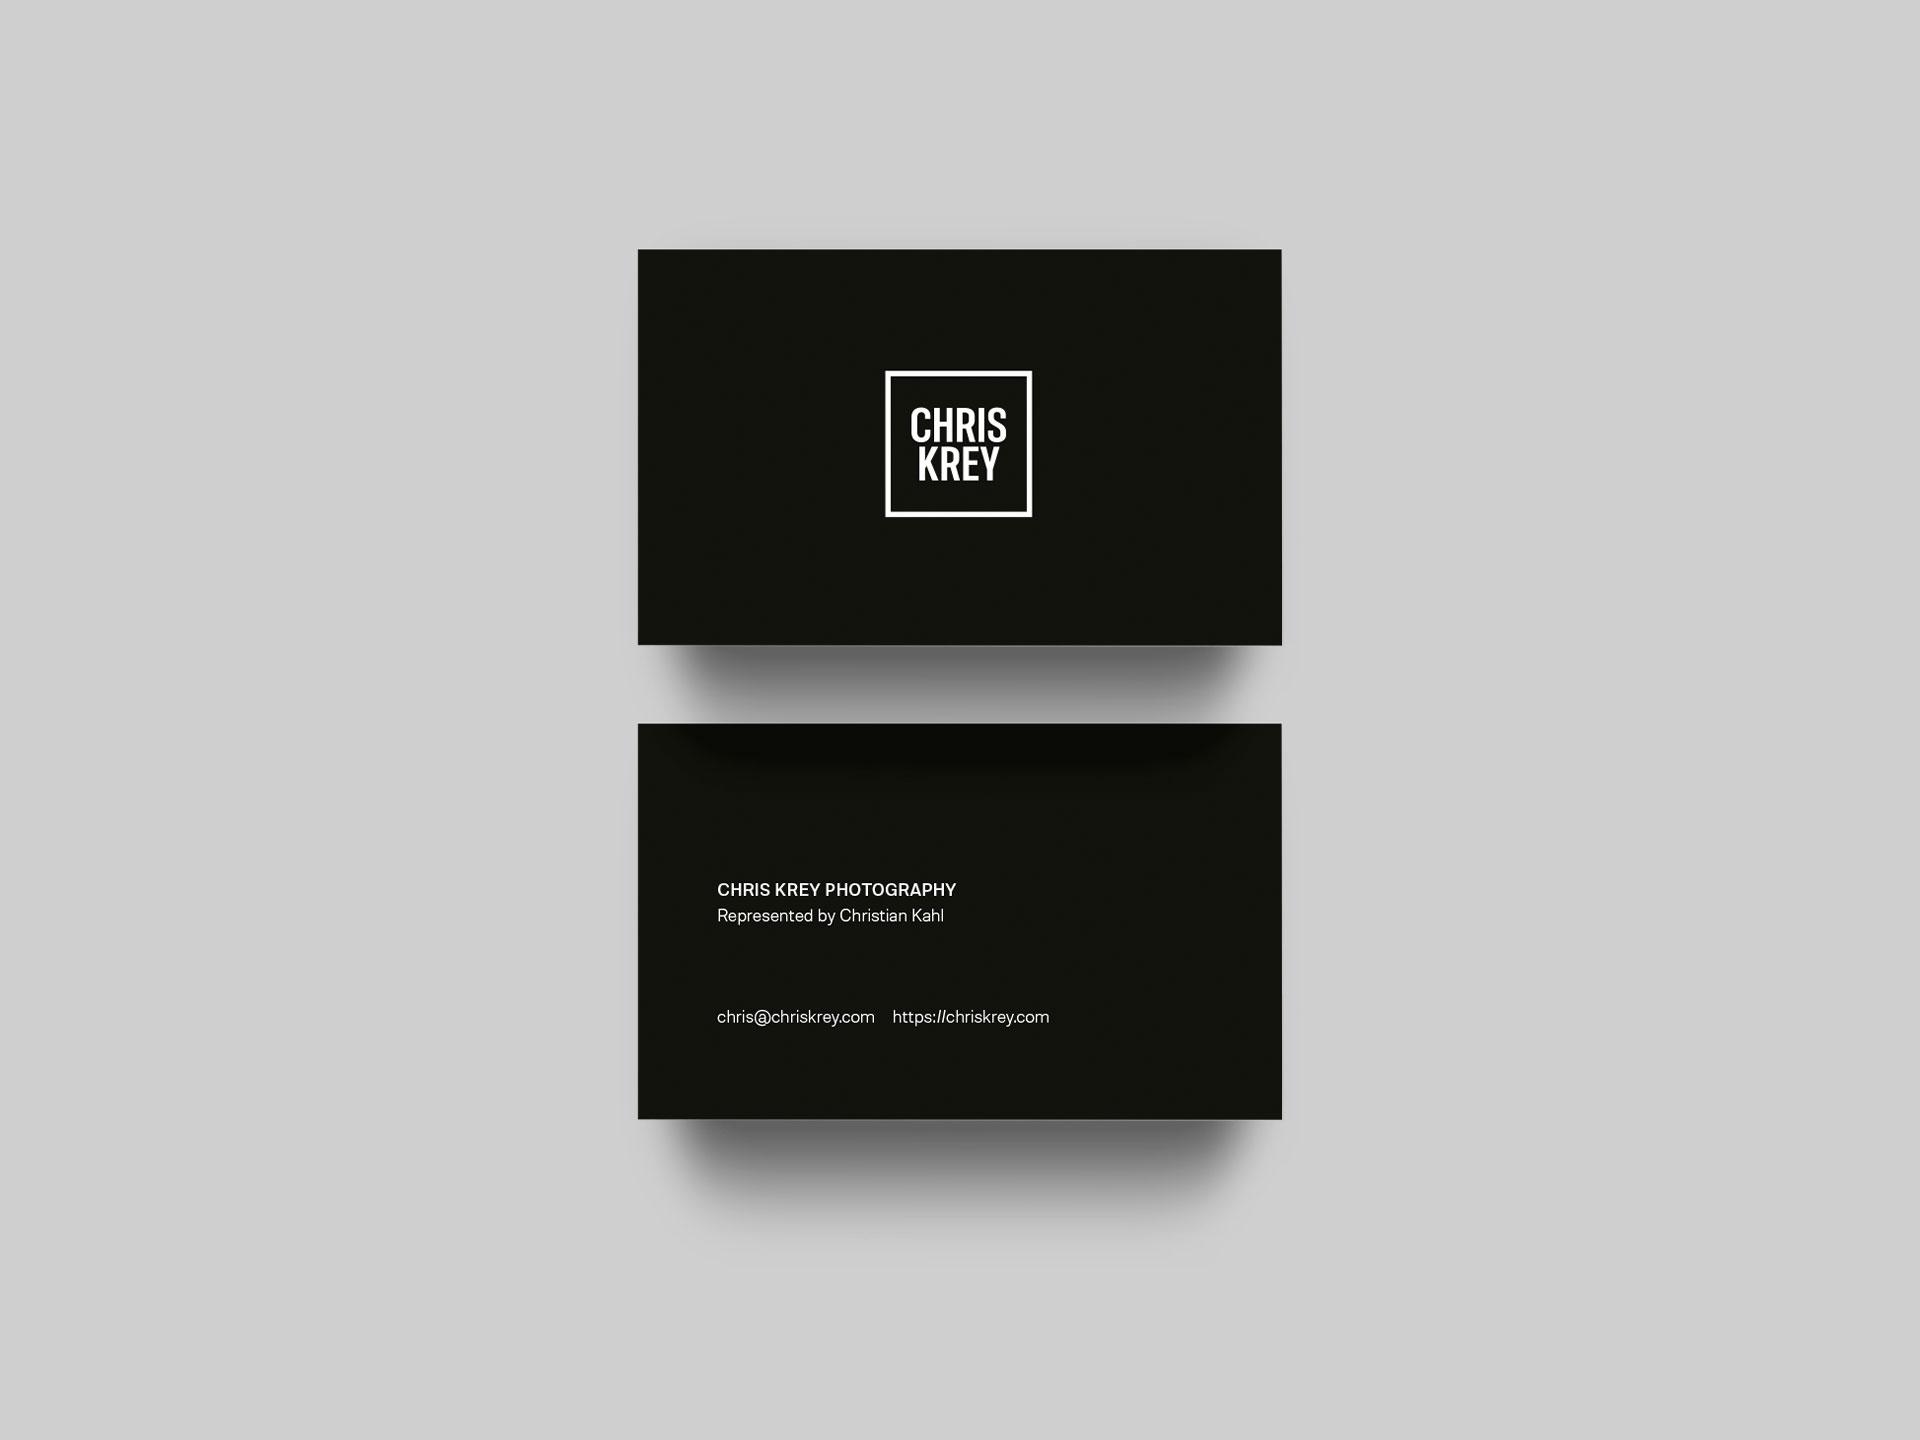 Chris Krey Photography Corporate Design